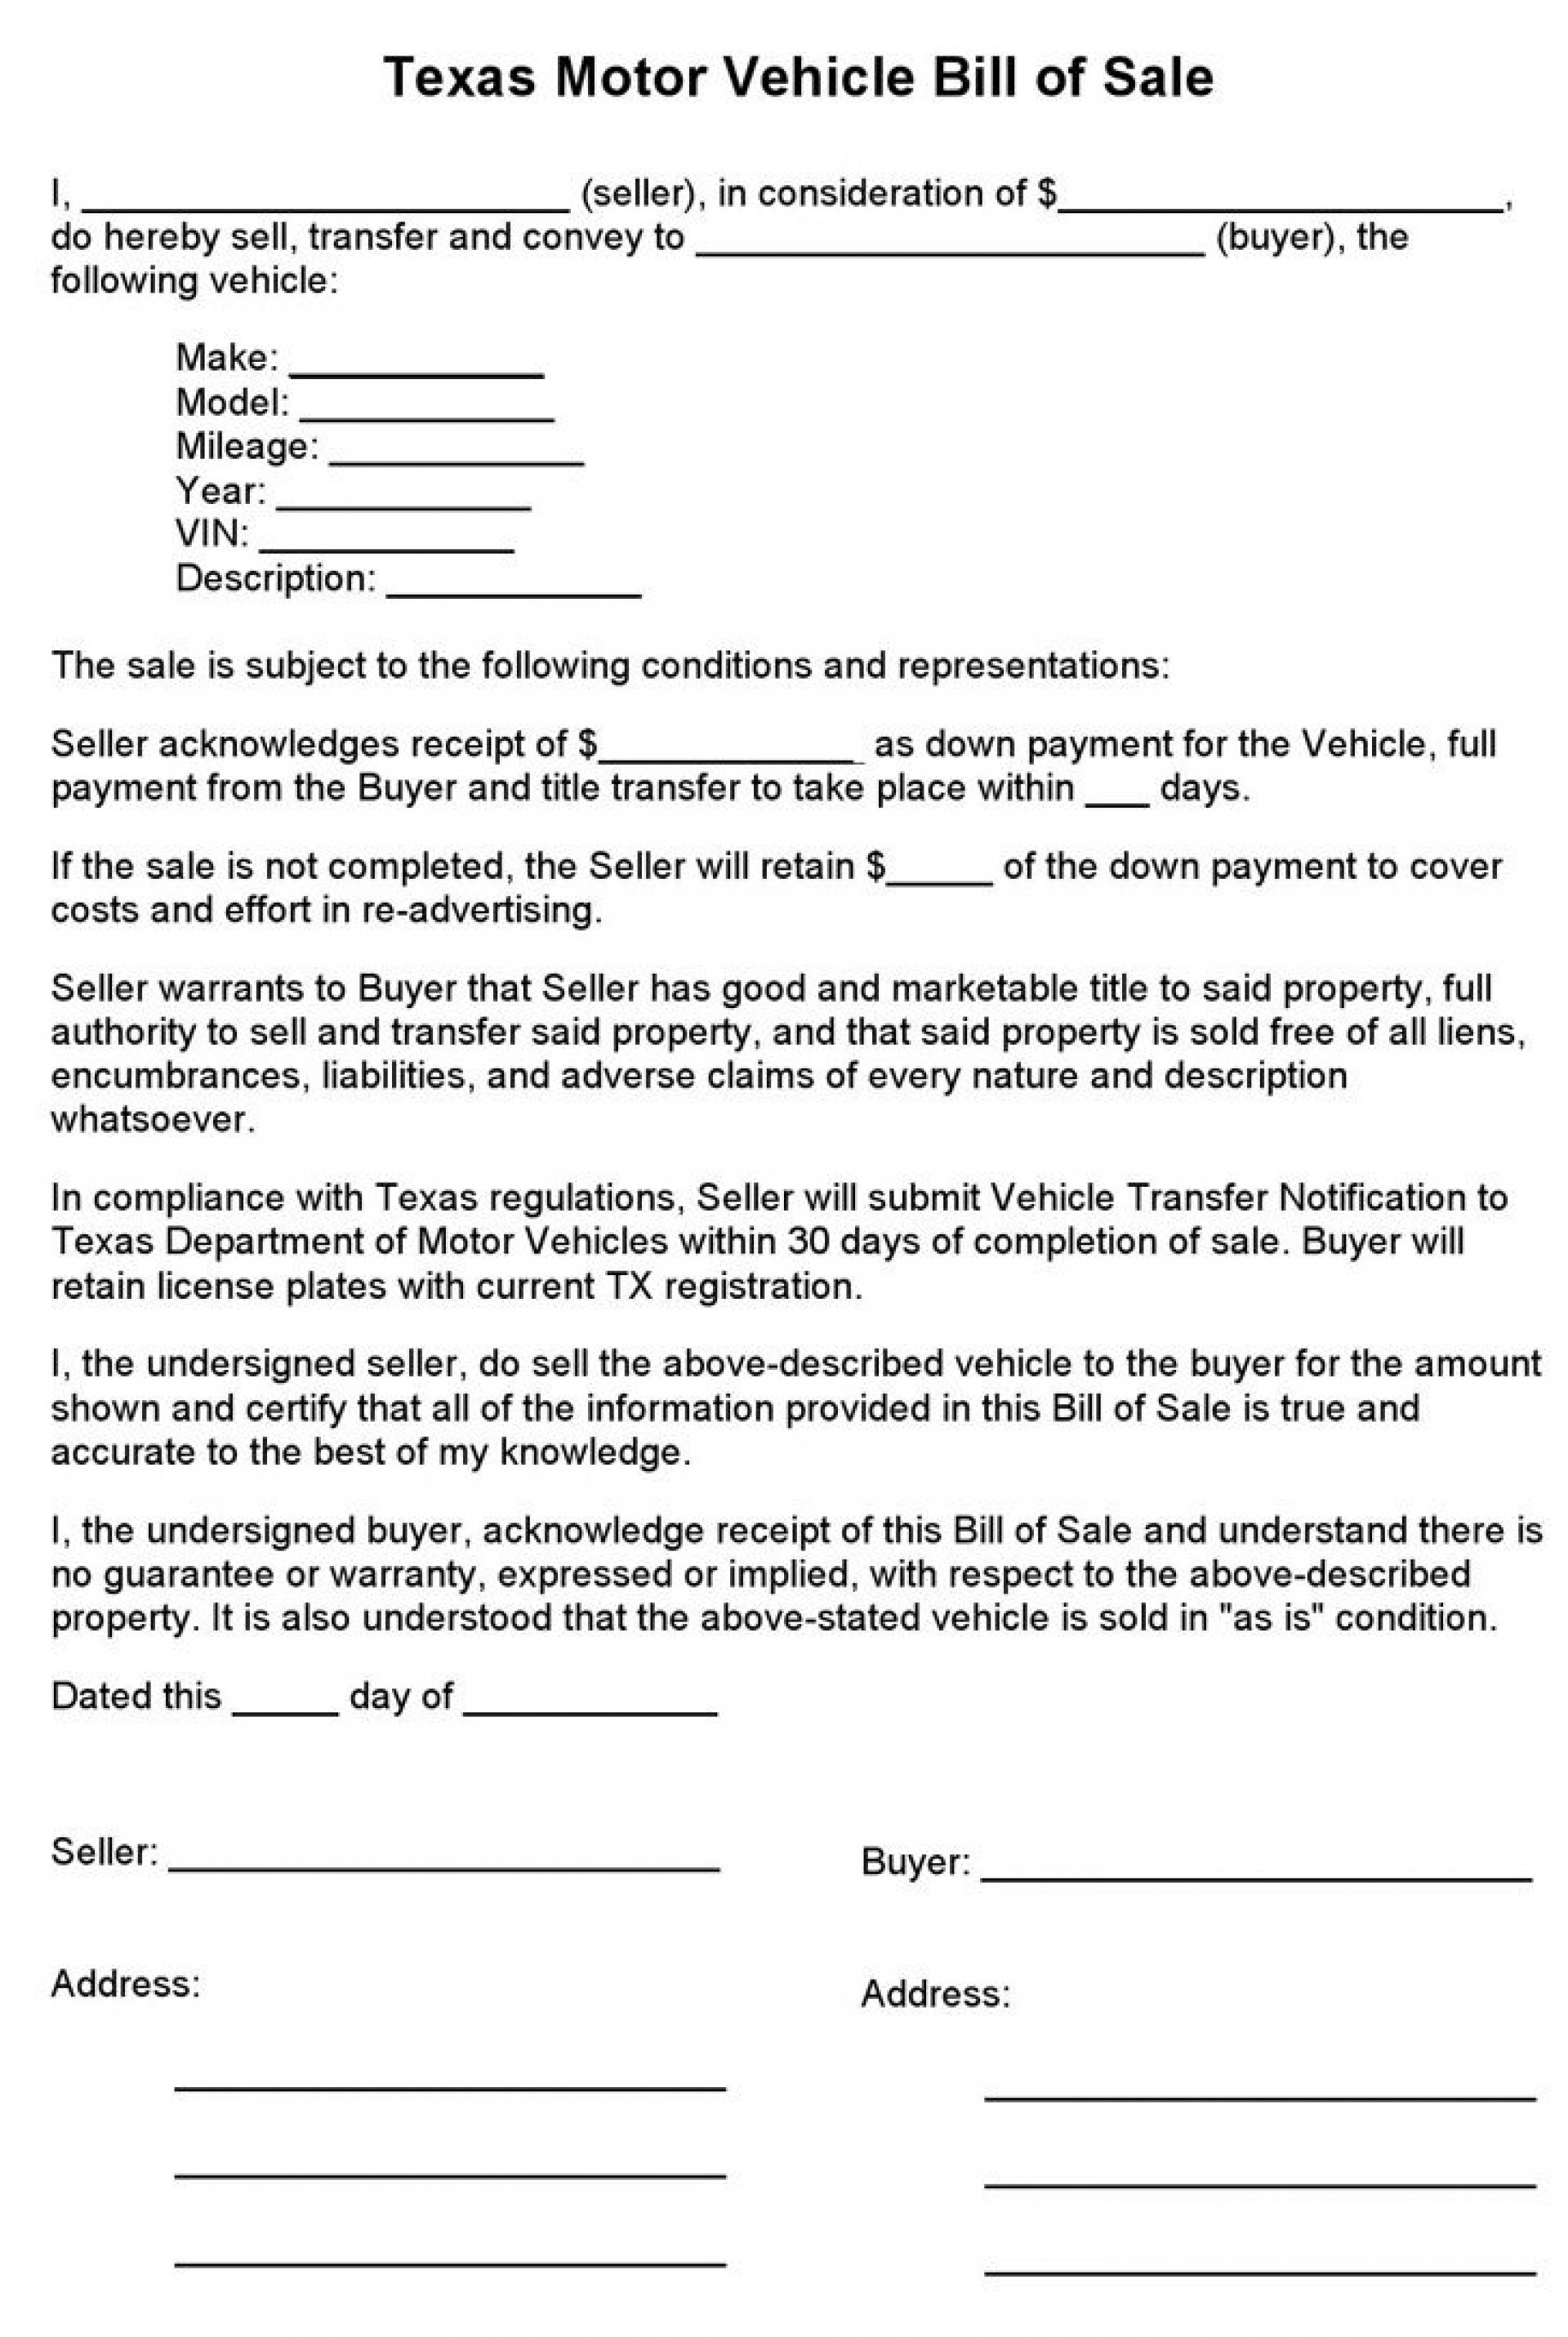 003 Dreaded Bill Of Sale Template Texa Design  Texas Free Car Form Dmv Document1920